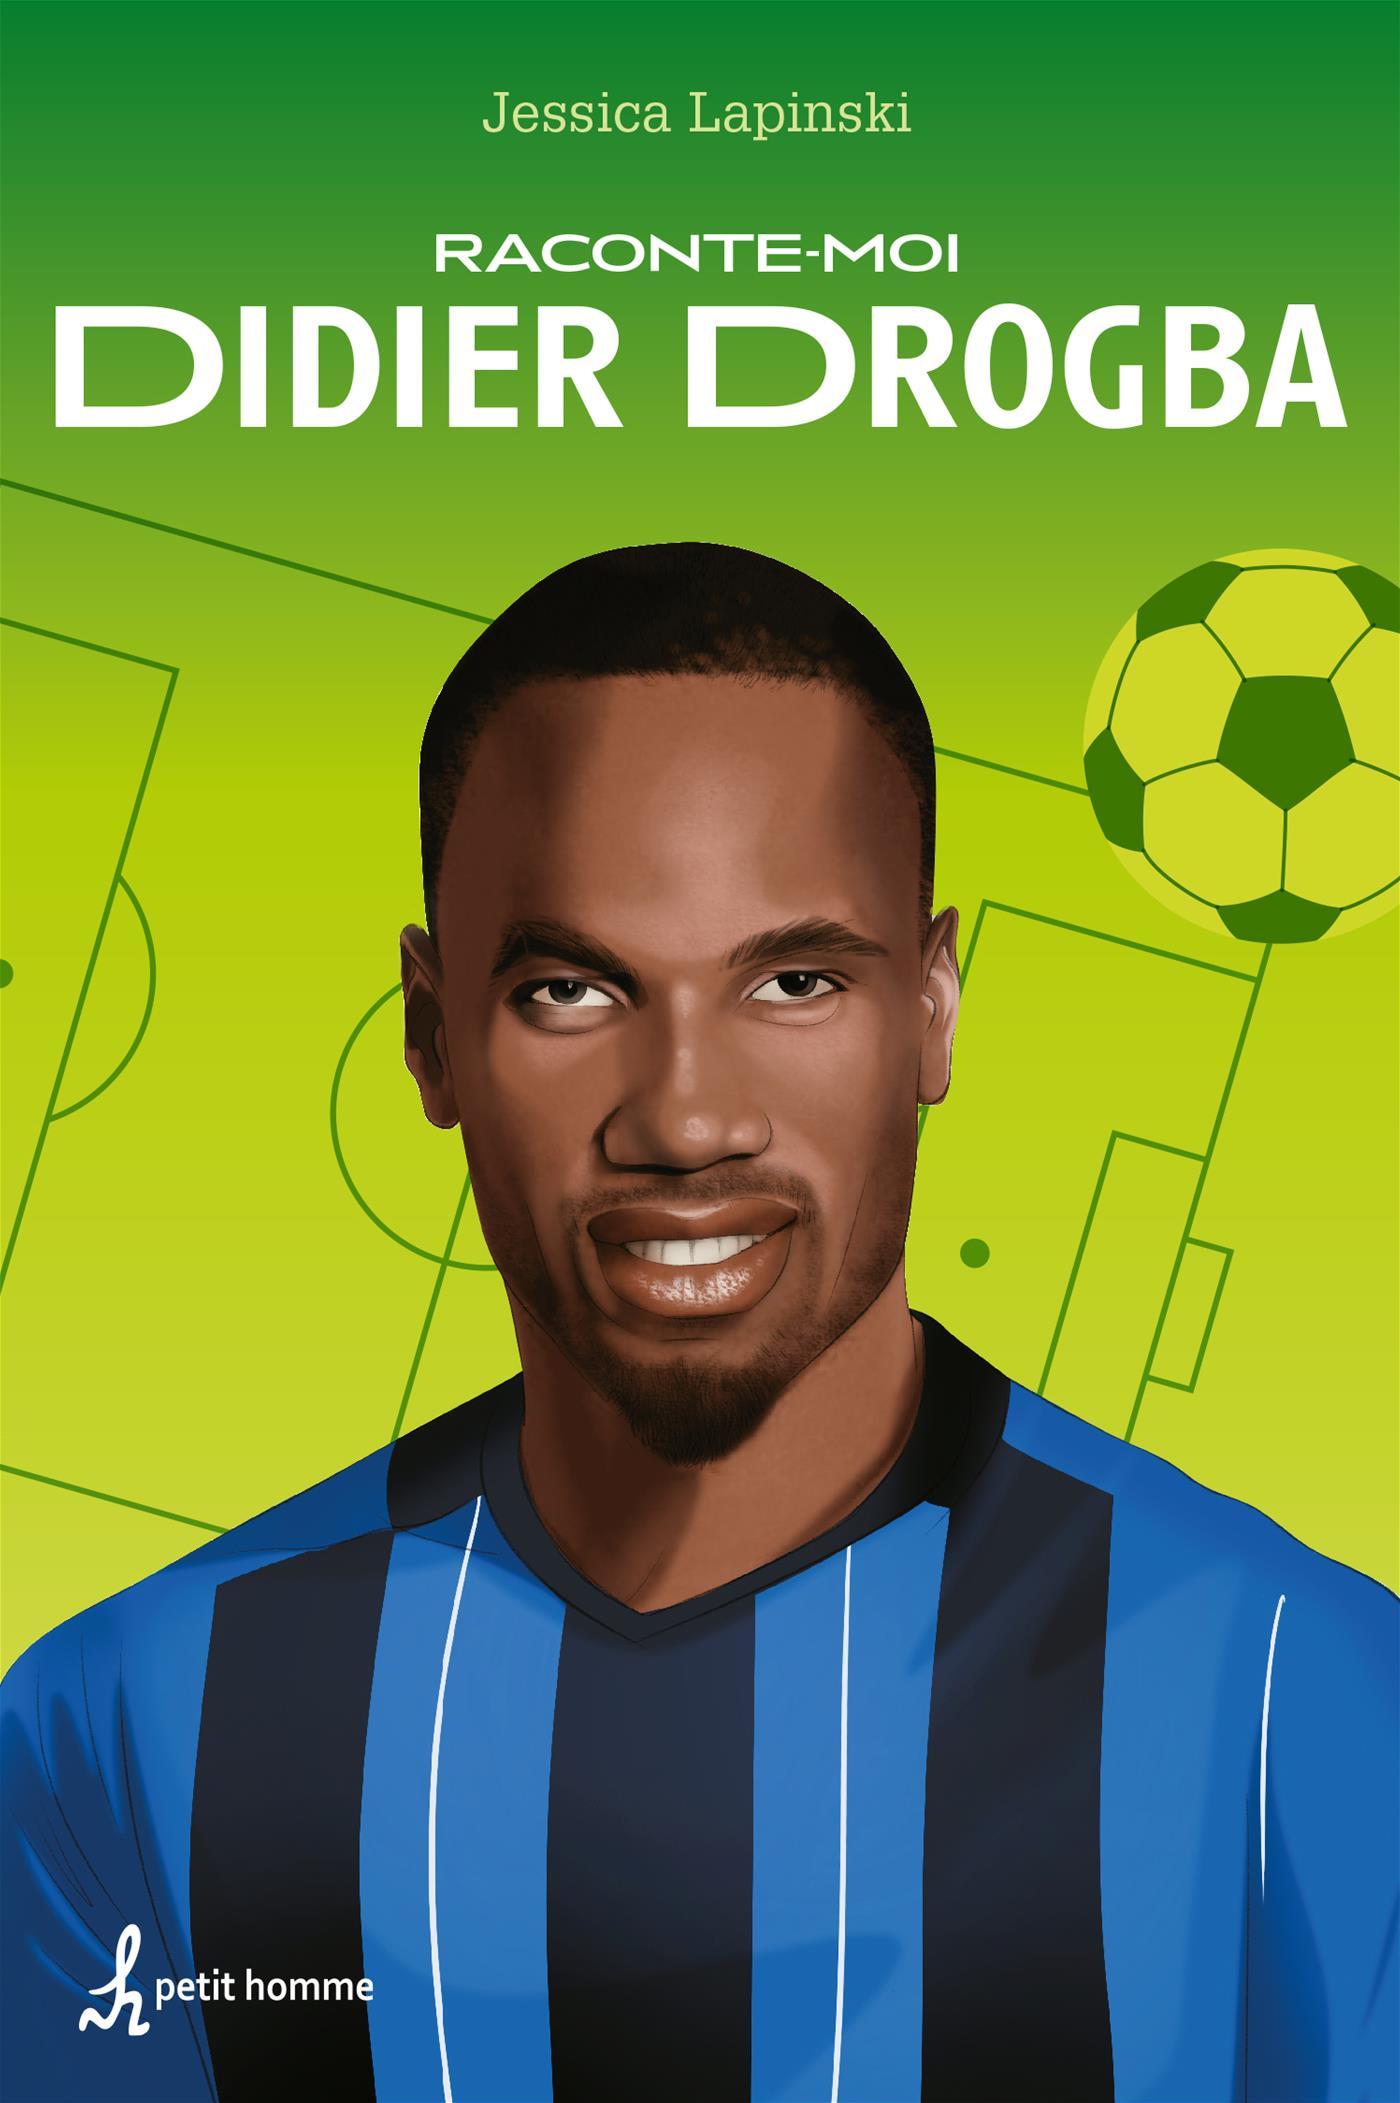 Raconte-moi Didier Drogba